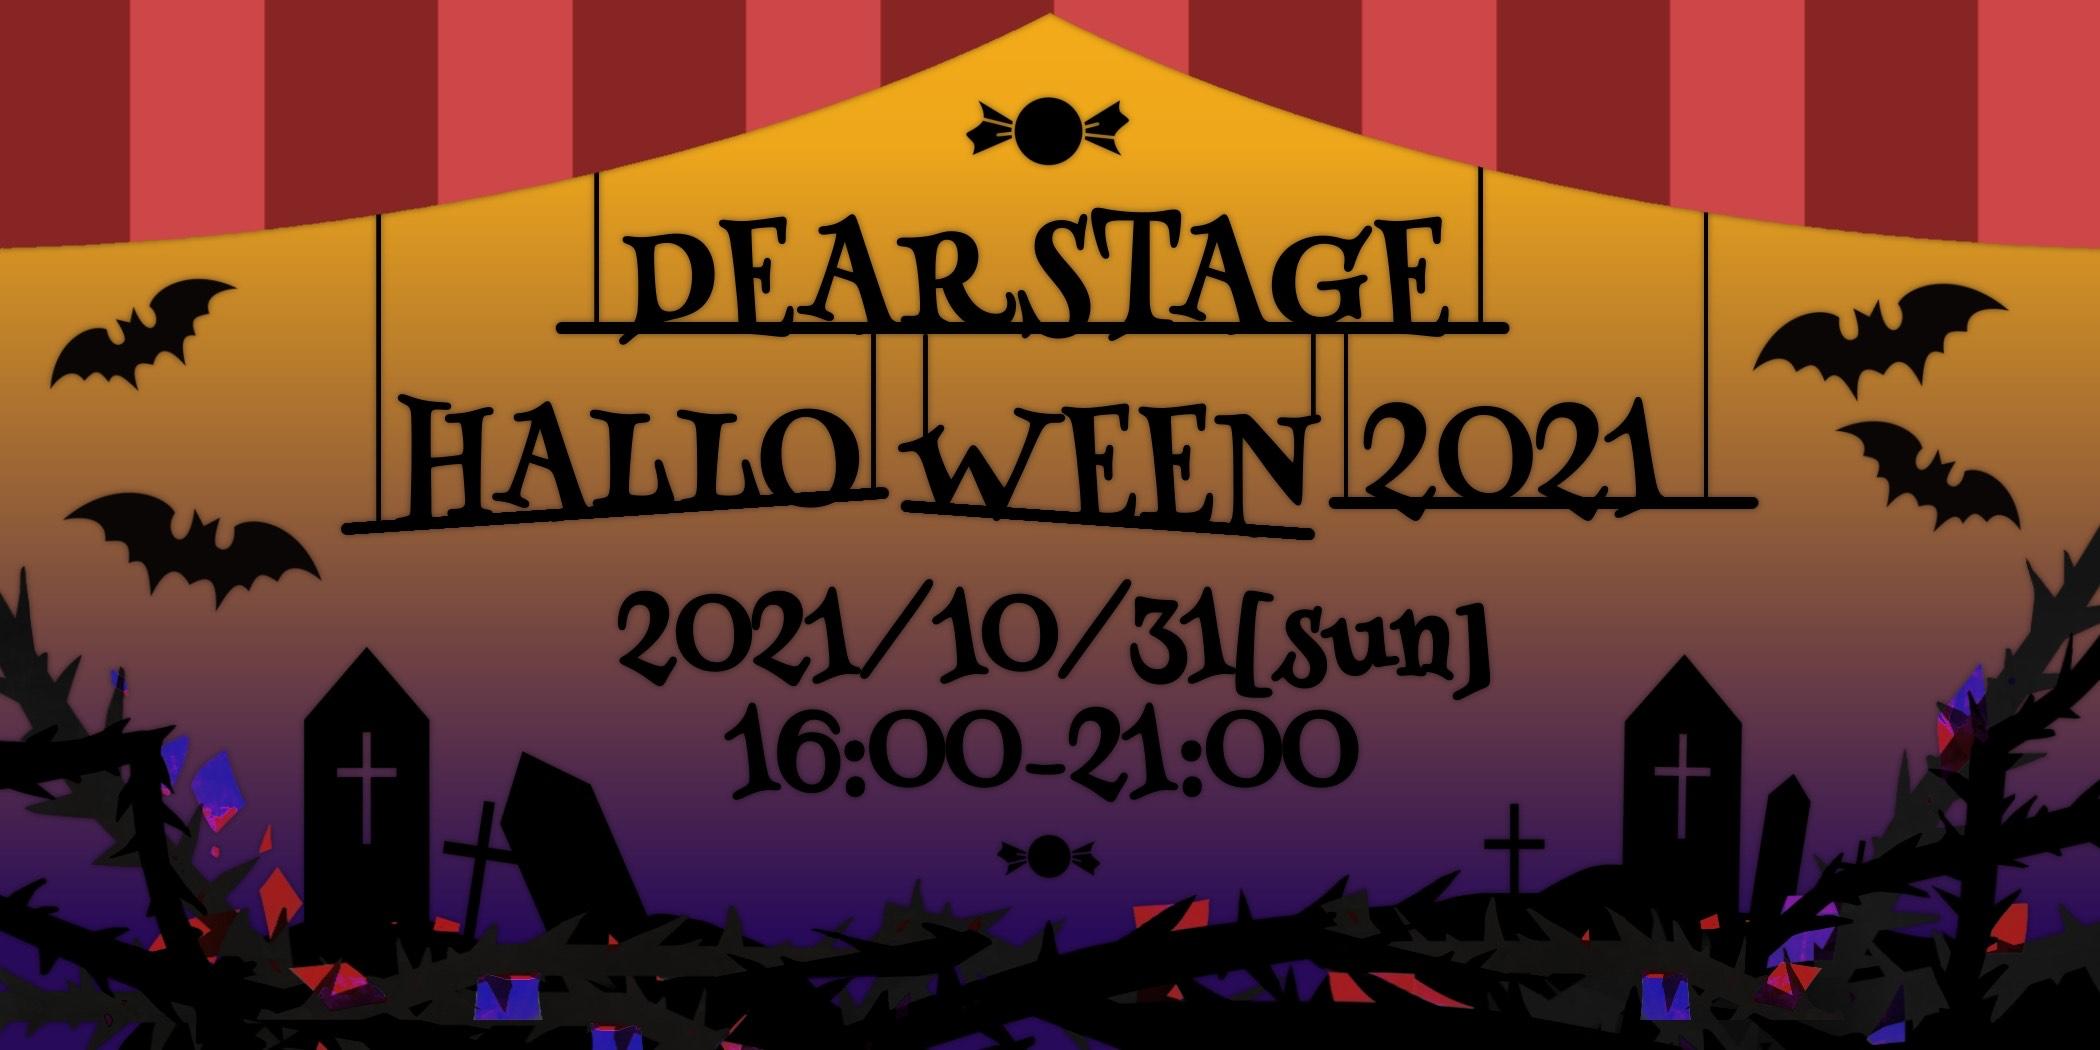 DEARSTAGE HALLOWEEN 2021